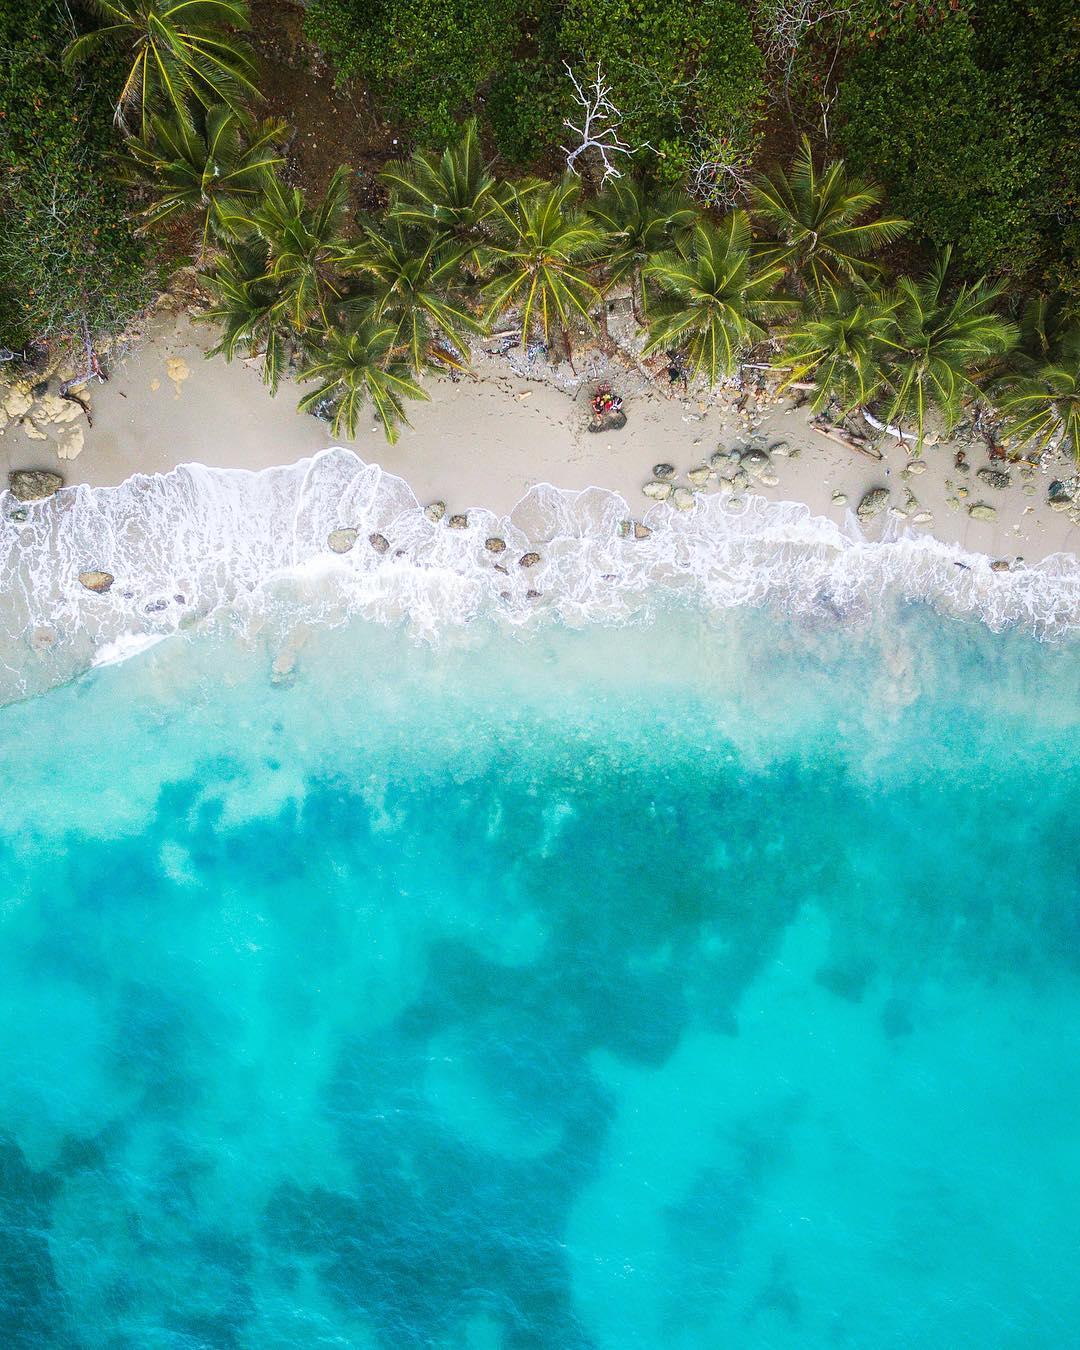 Захватывающие пейзажи на аэрофотоснимках Майкла Матти